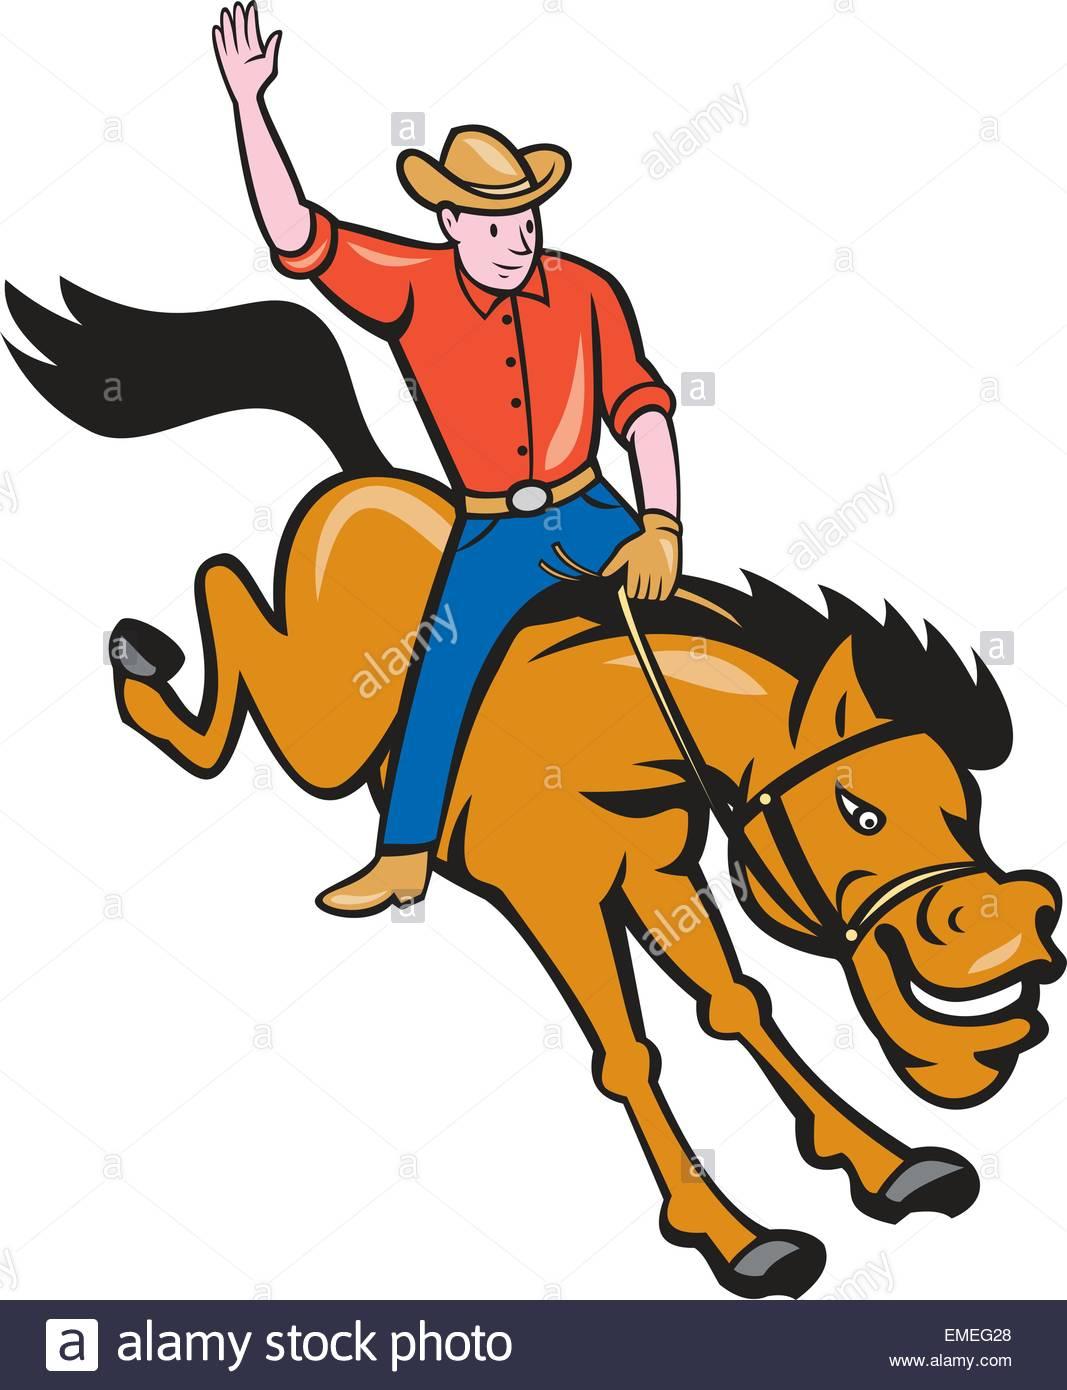 1067x1390 Rodeo Cowboy Riding Bucking Bronco Cartoon Stock Vector Art